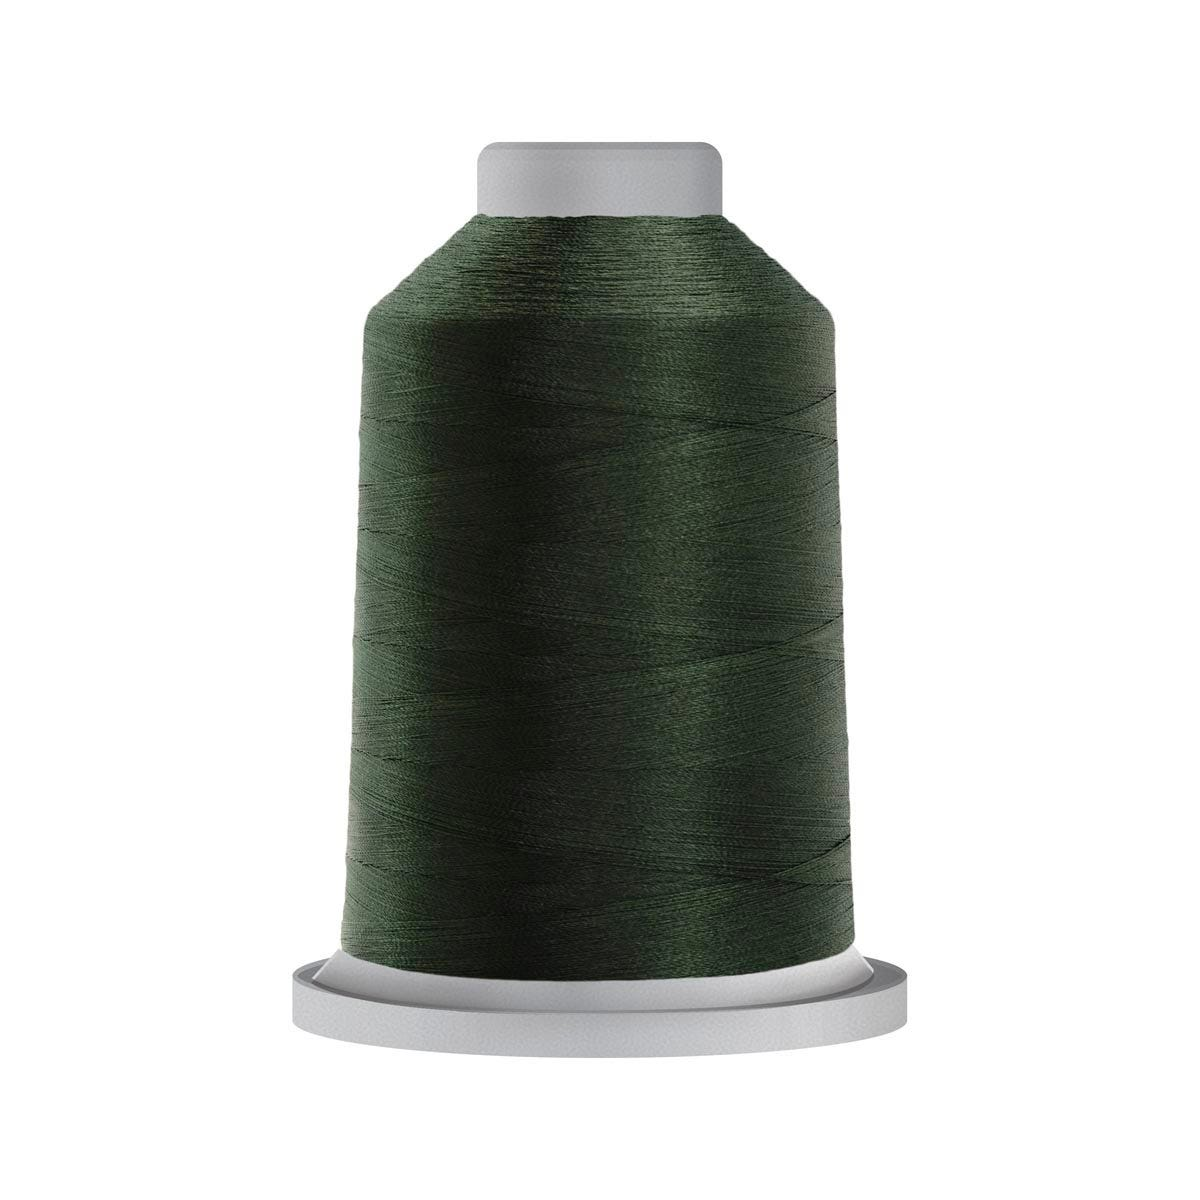 embroidery thread Sepia spool Thread Fil-Tec Sepia Brown Thread vibrant thread brown sewing Glide Thread Glide Thread by Fil-Tec